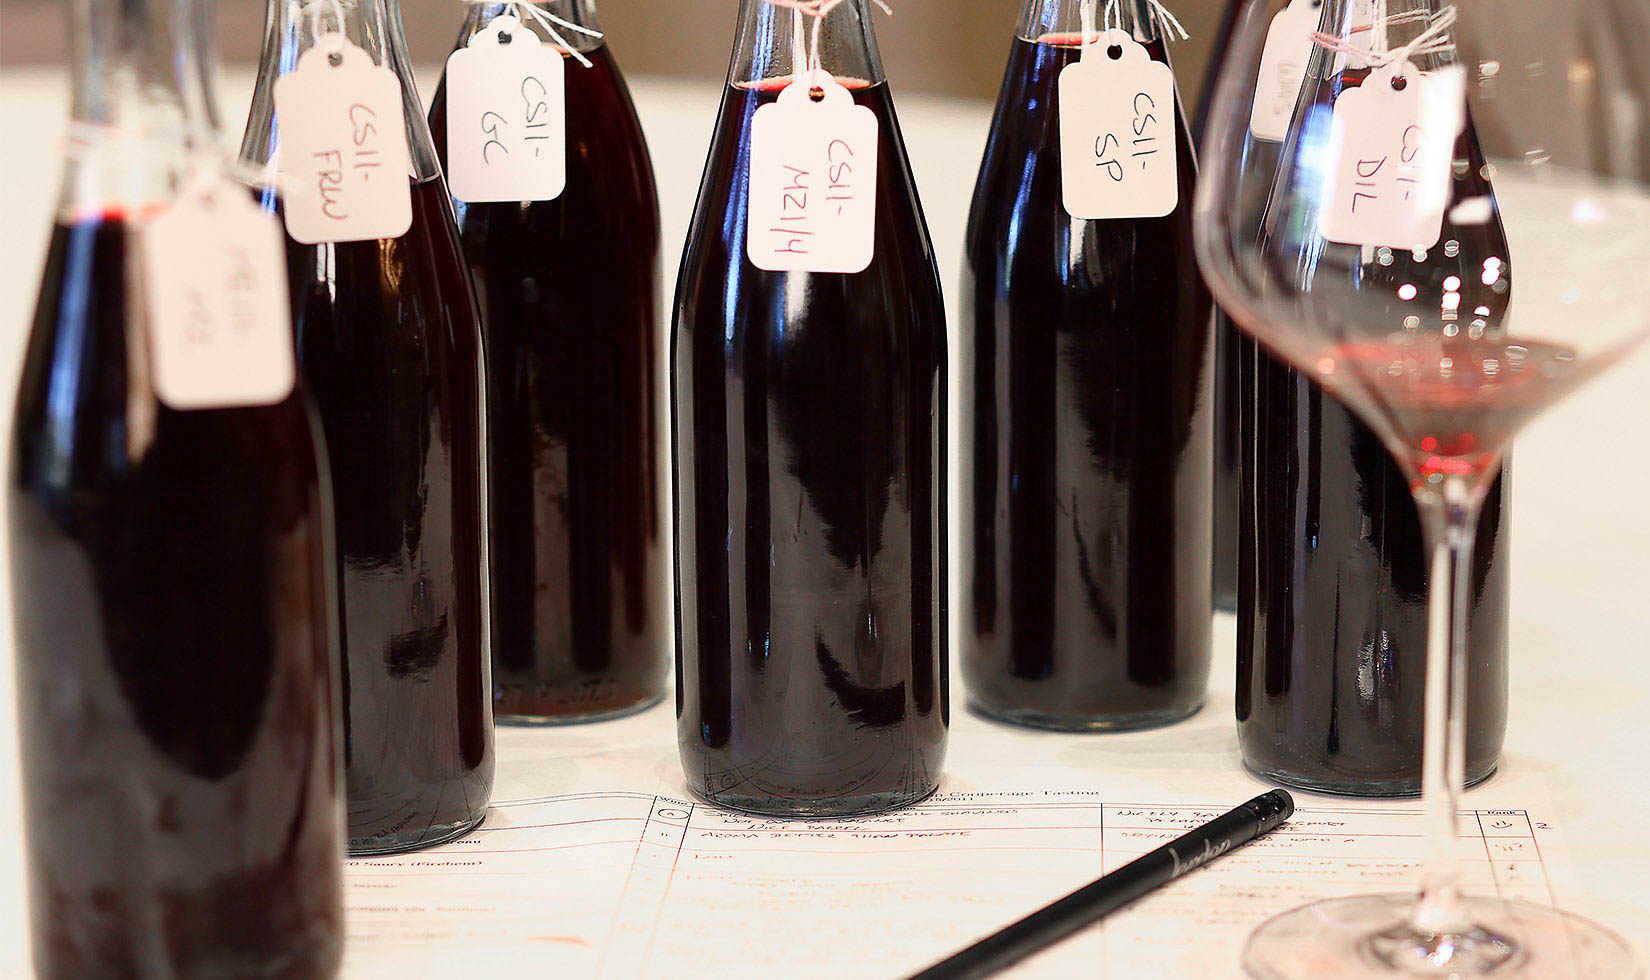 How to make wine: blending in Jordan winemaking